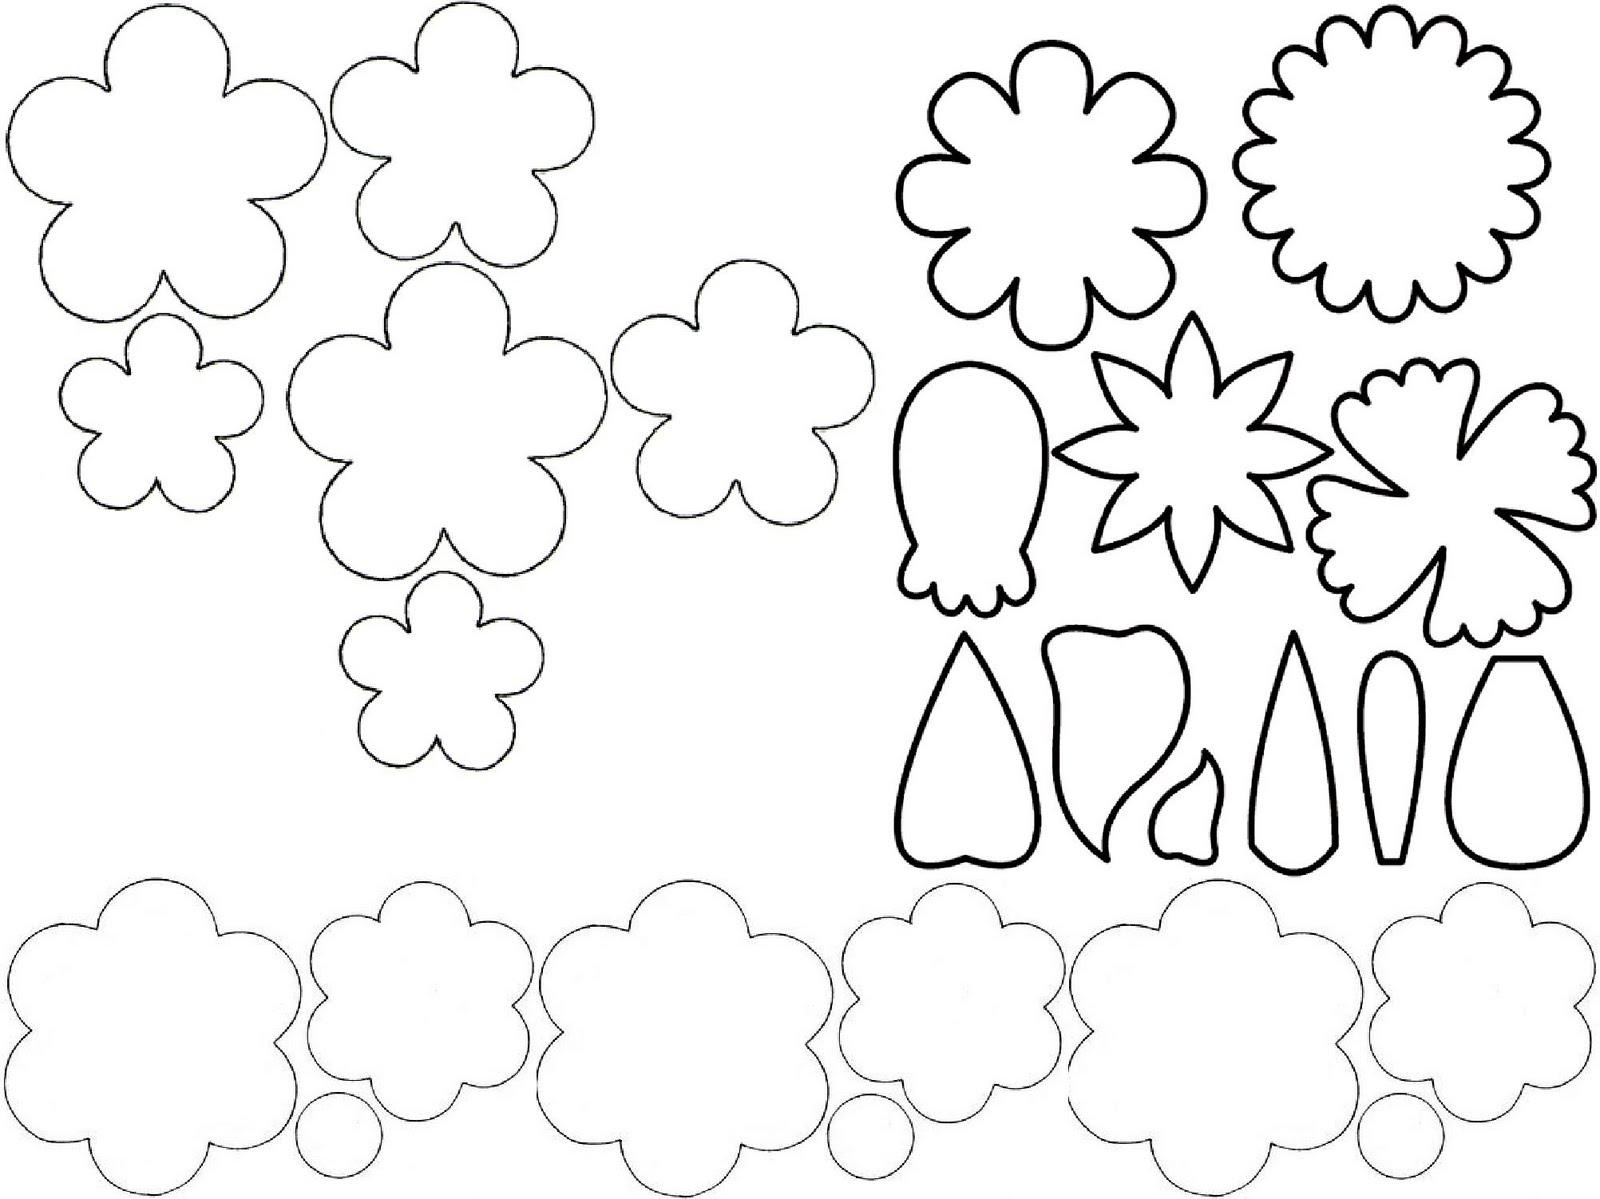 RobbyGurl's Creations: Foam Flower Hairbows